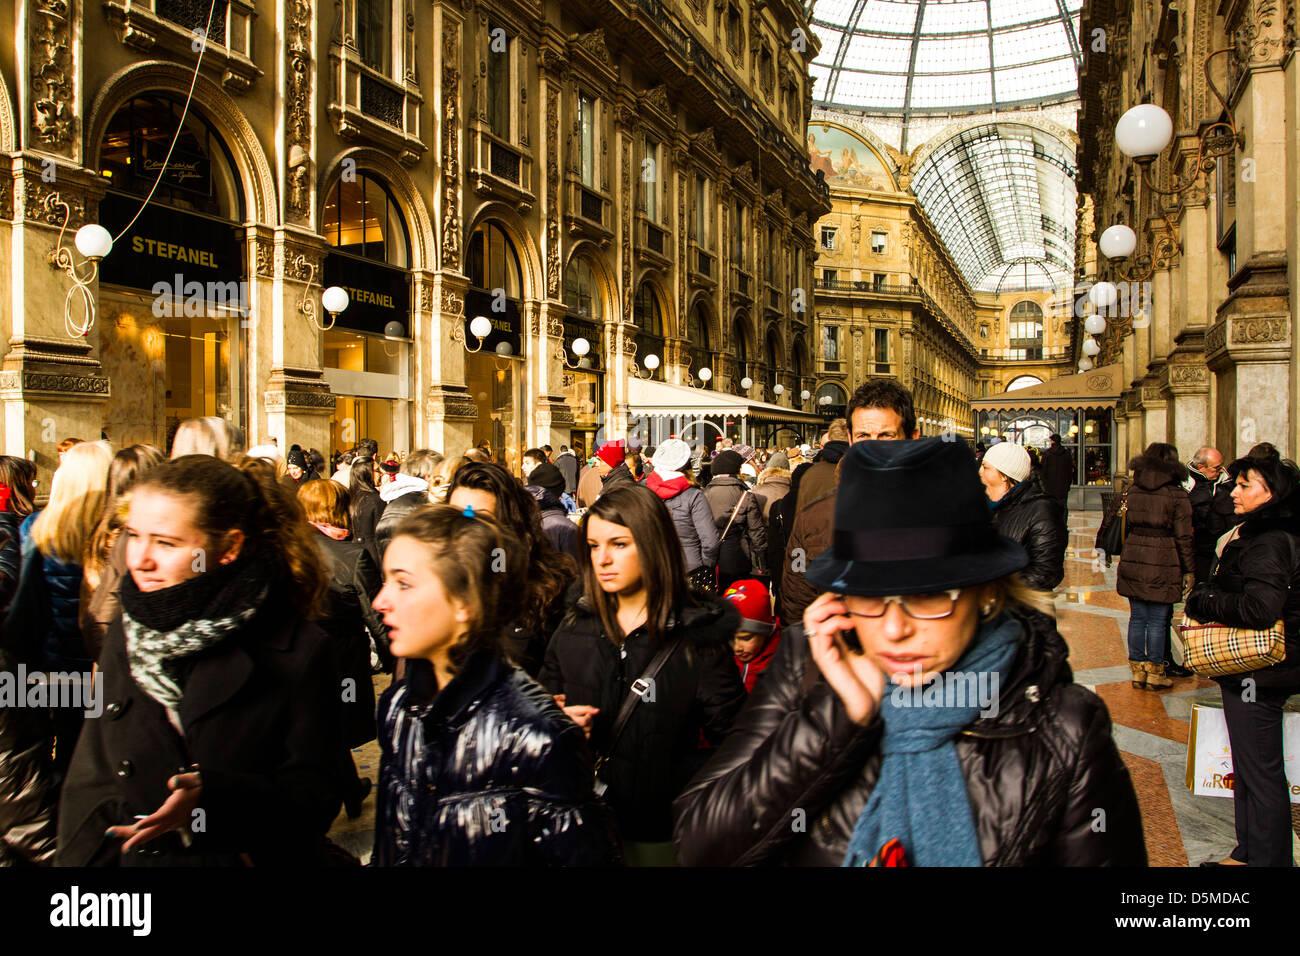 Interior of Gallery Vittorio Emanuele II (Galleria Vittorio Emanuele II), the oldest shopping mall in Italy. - Stock Image